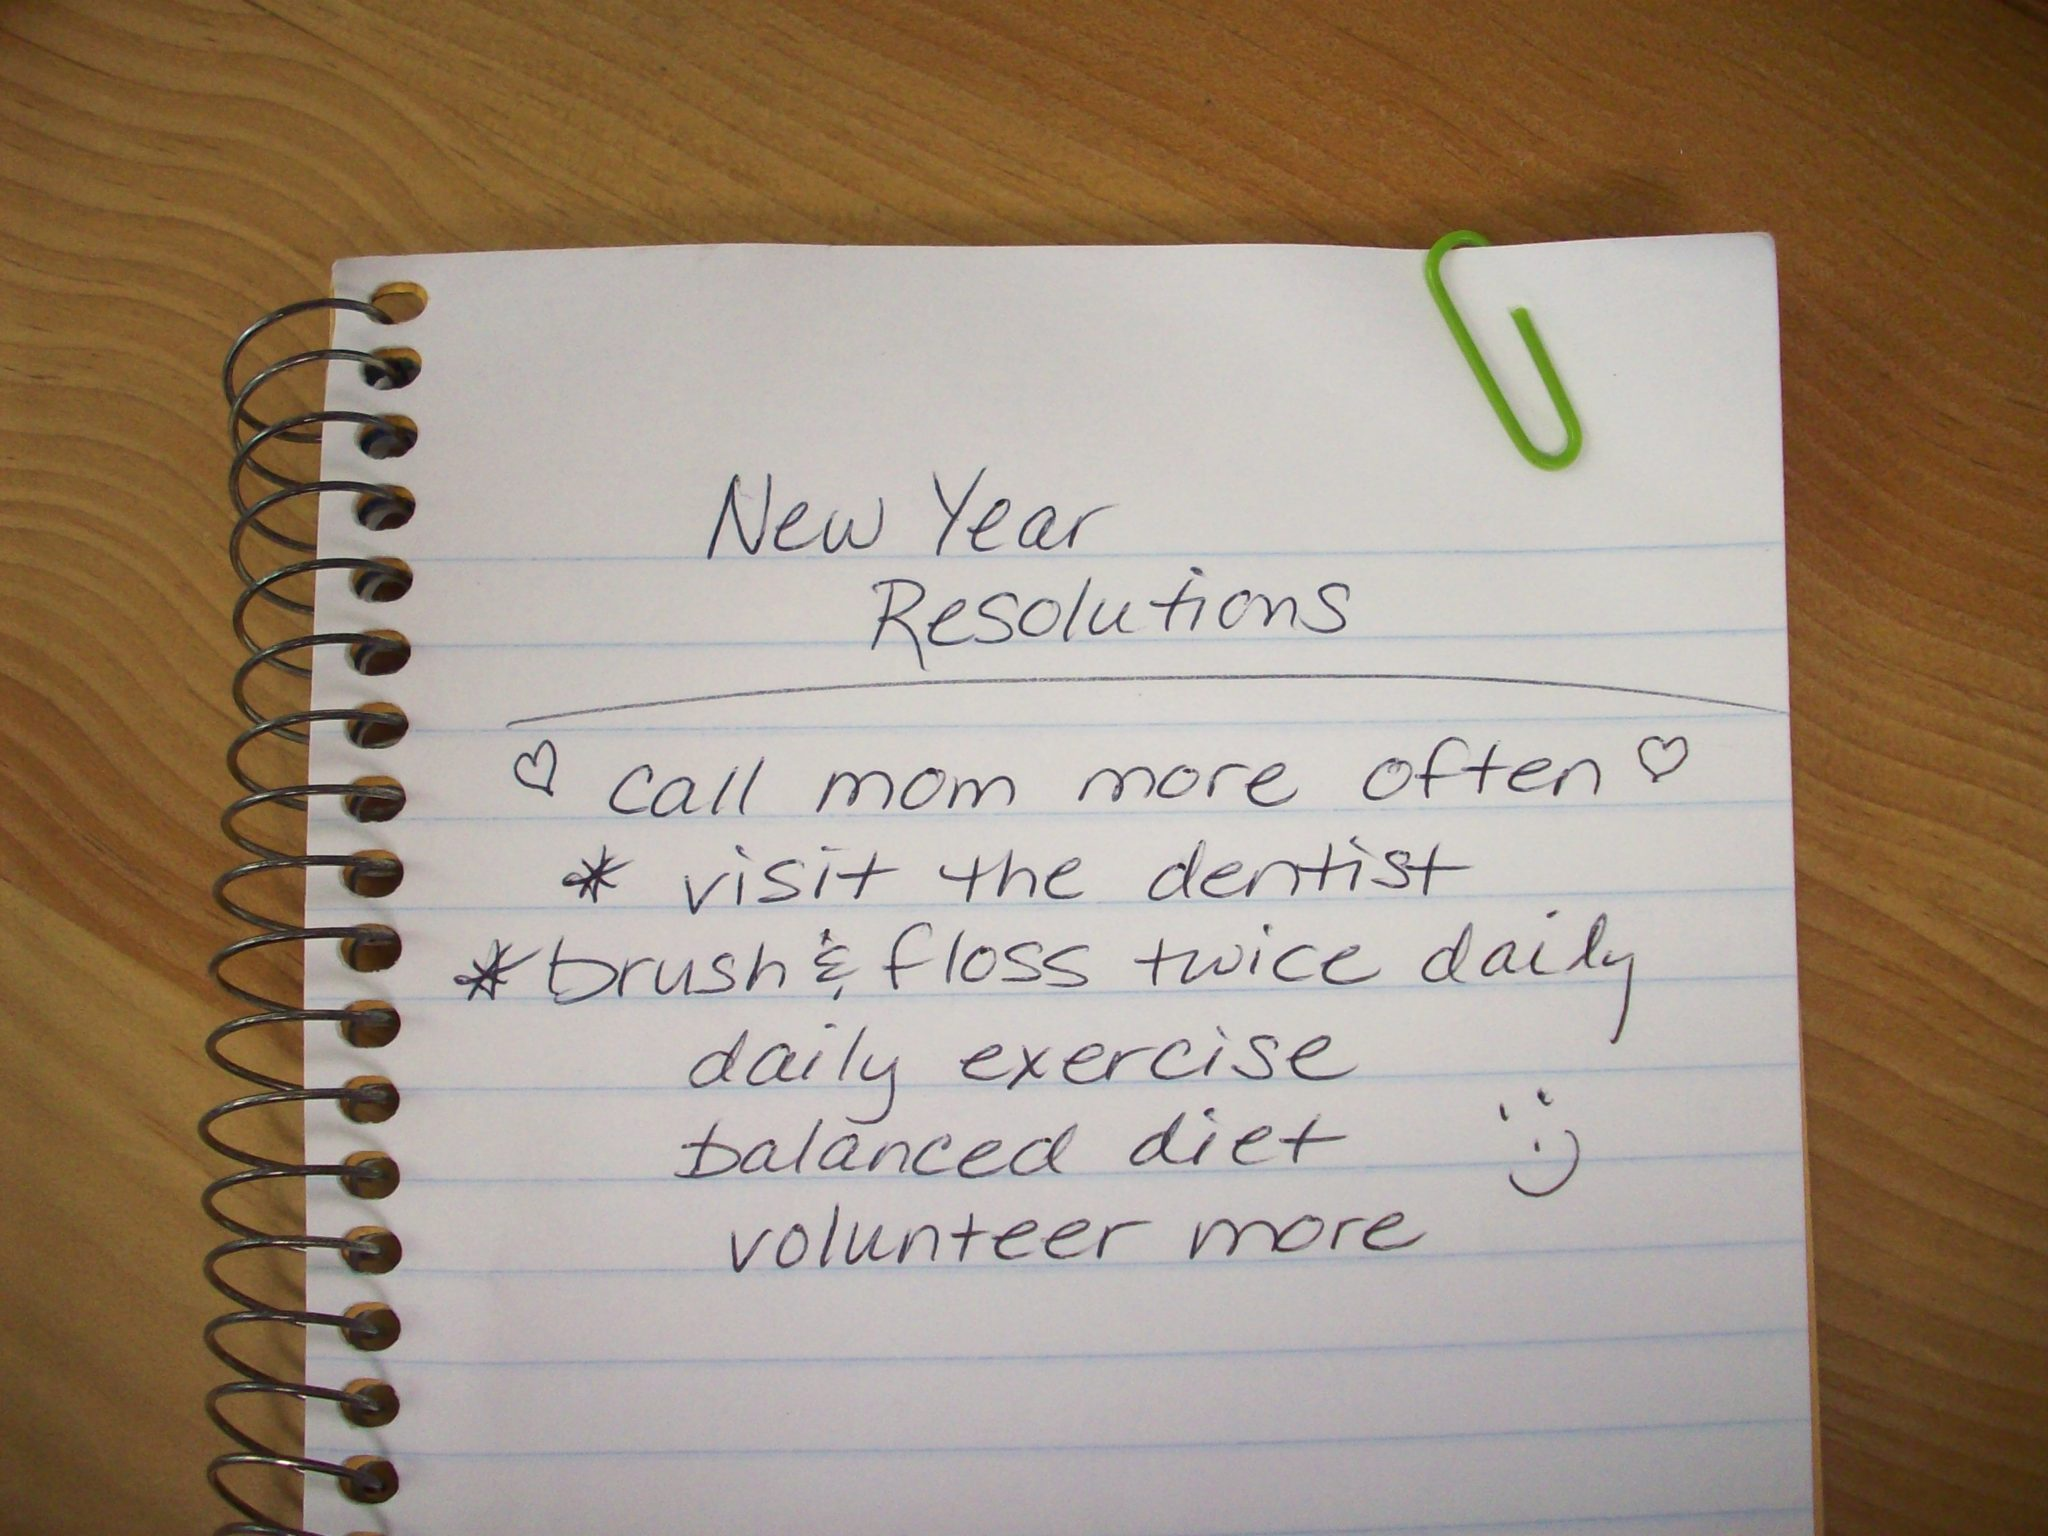 Resolutions at Seasons of Smiles Dental